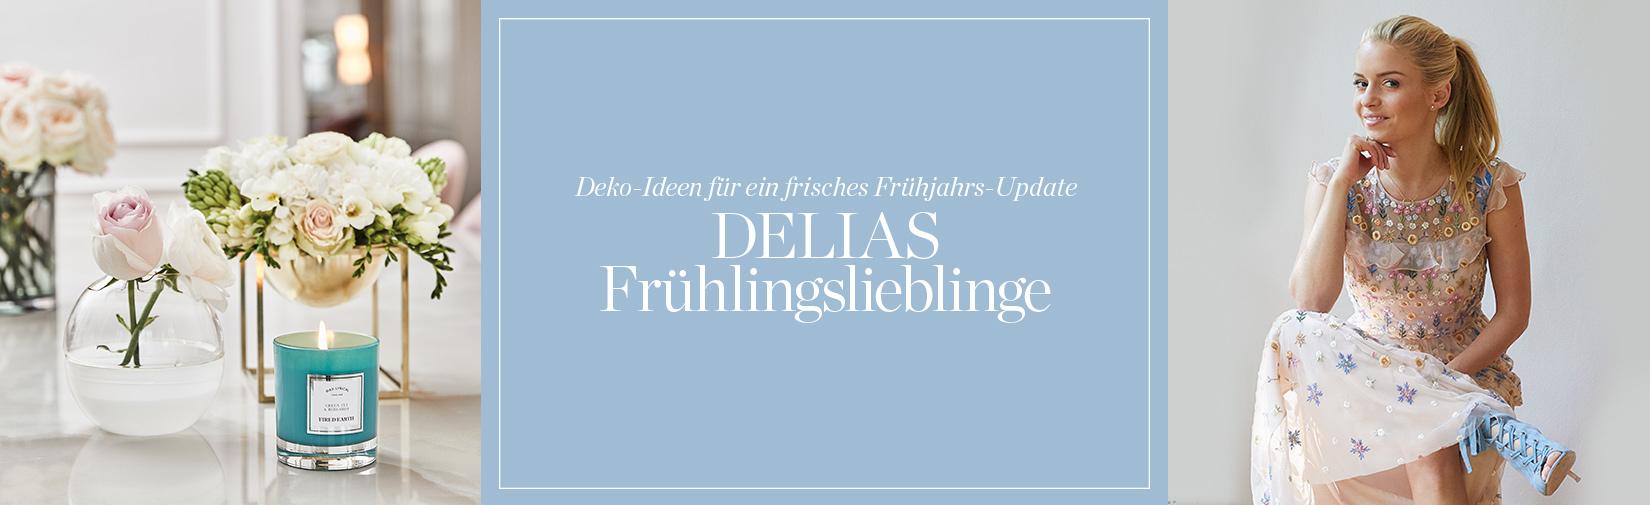 LP_Delias_Frühlingstipps_Desktop_Neu